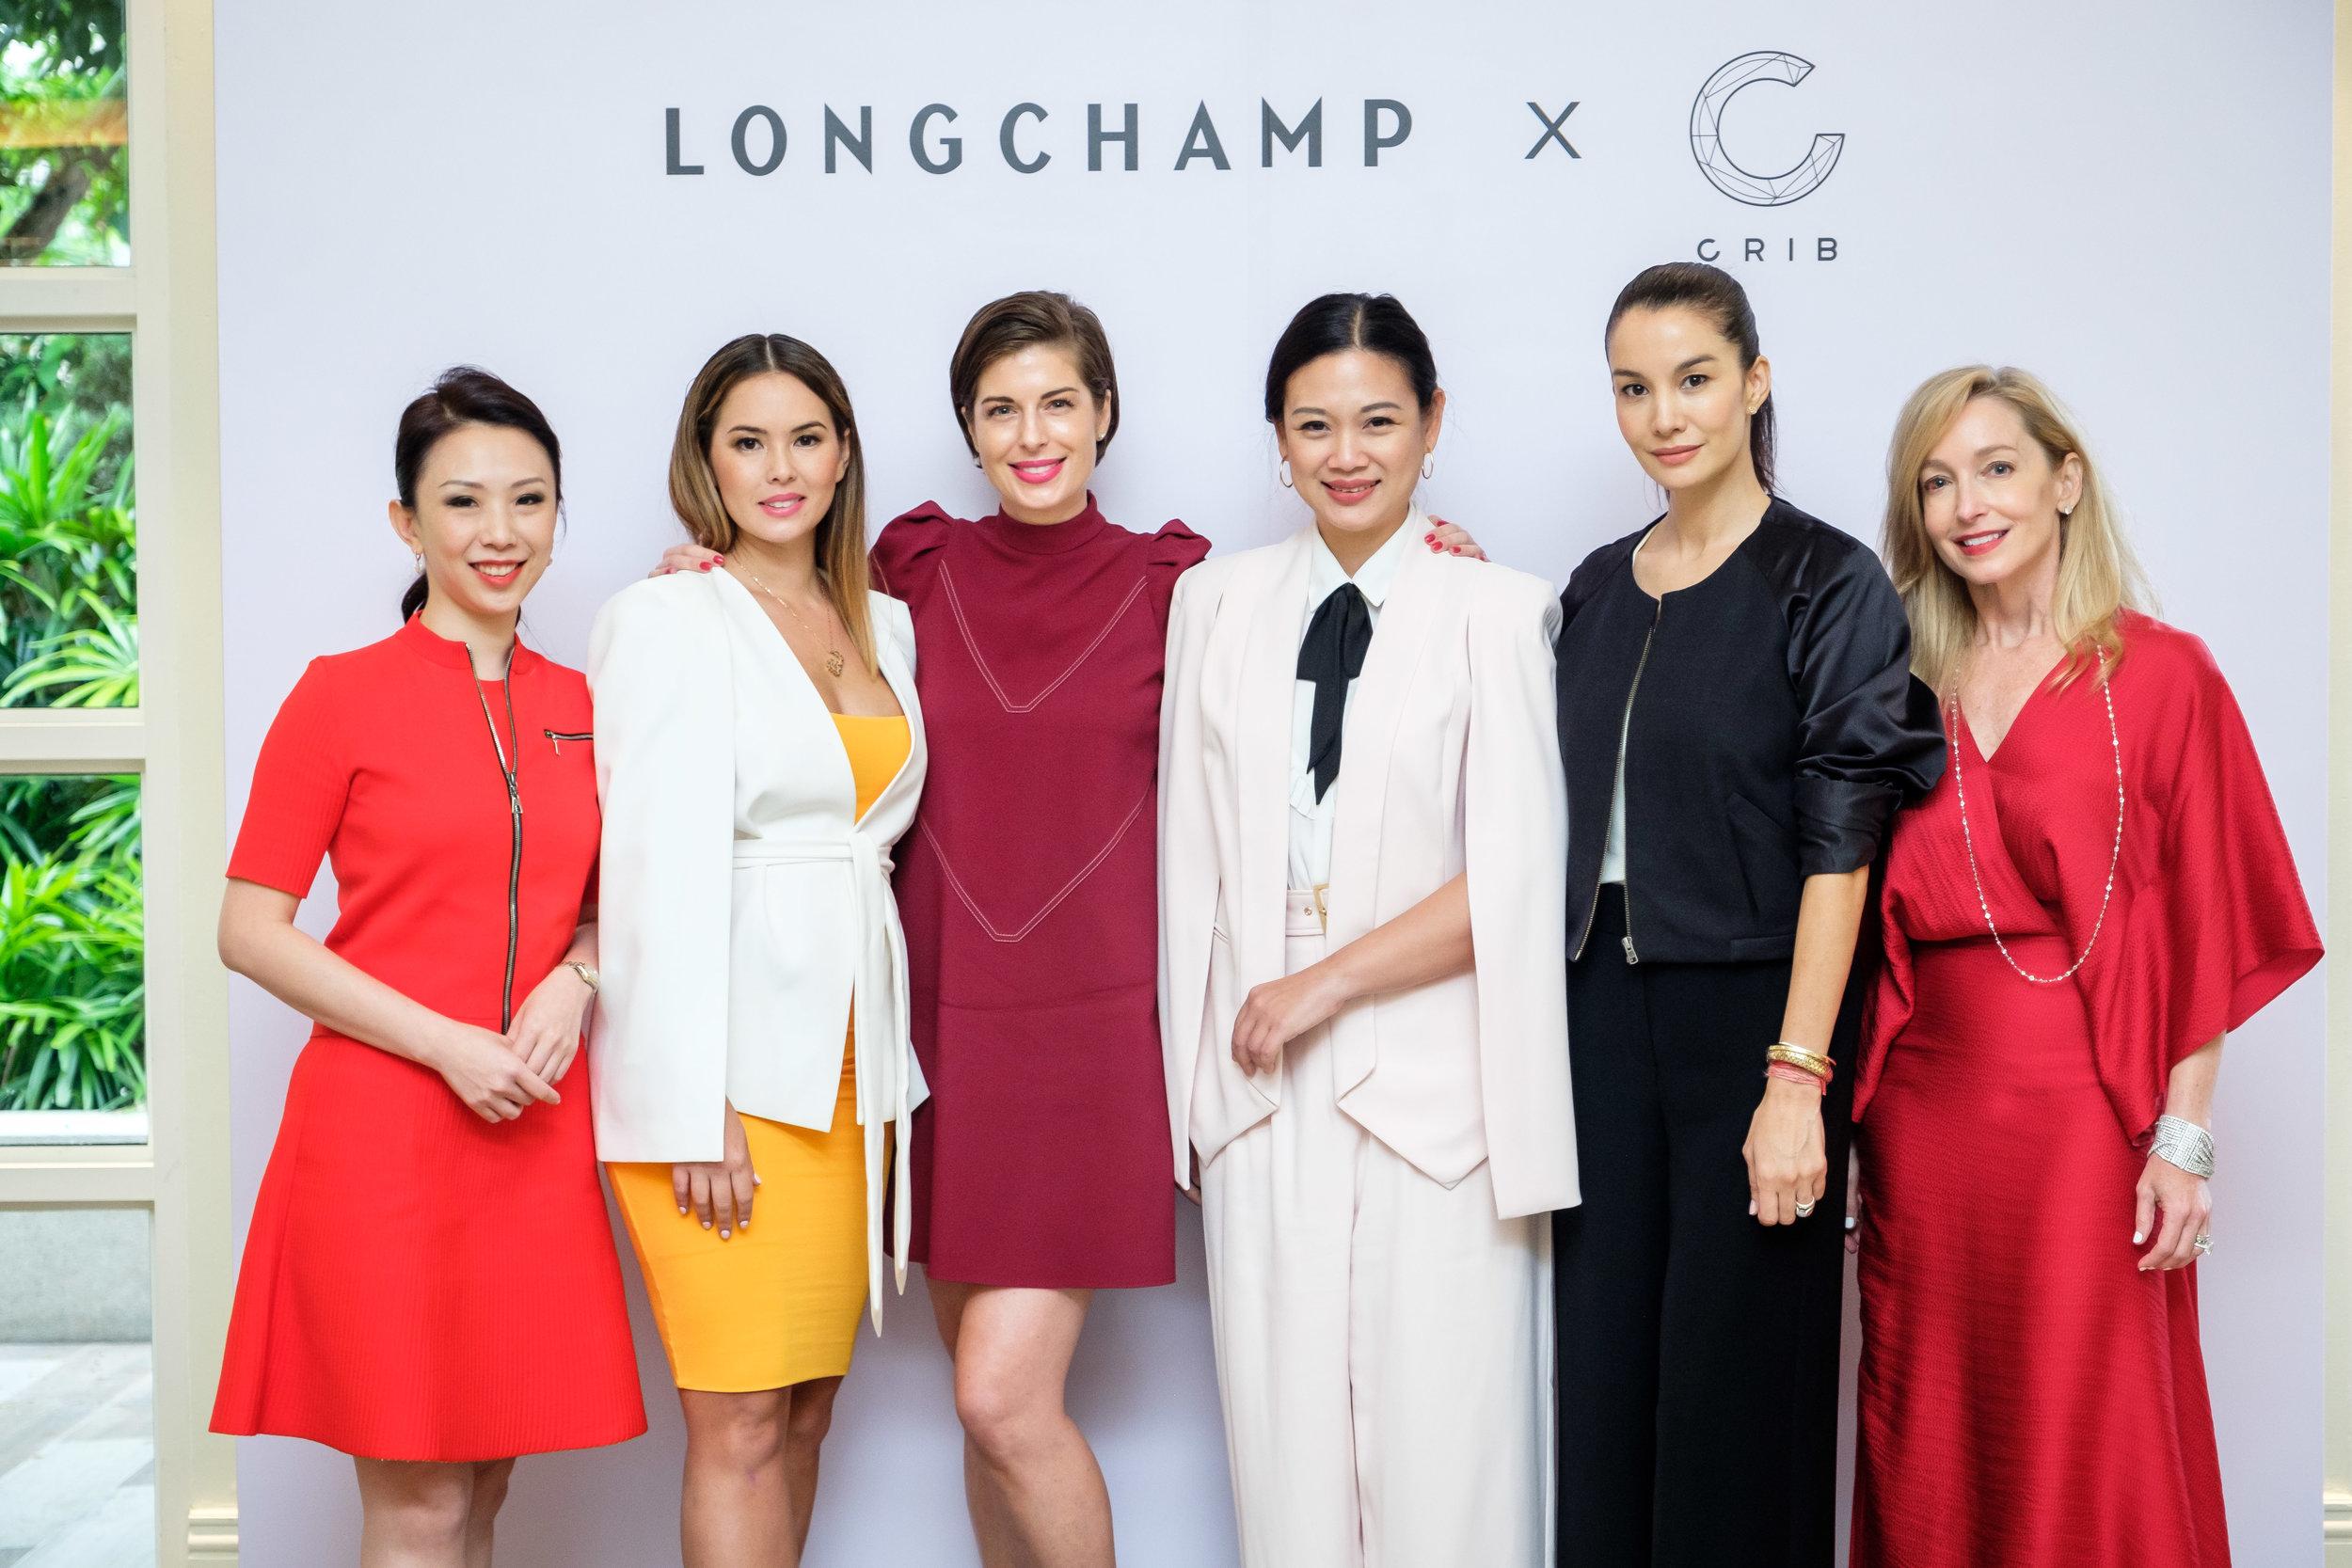 CRIB X Longchamp Lunch 249-2666.jpg